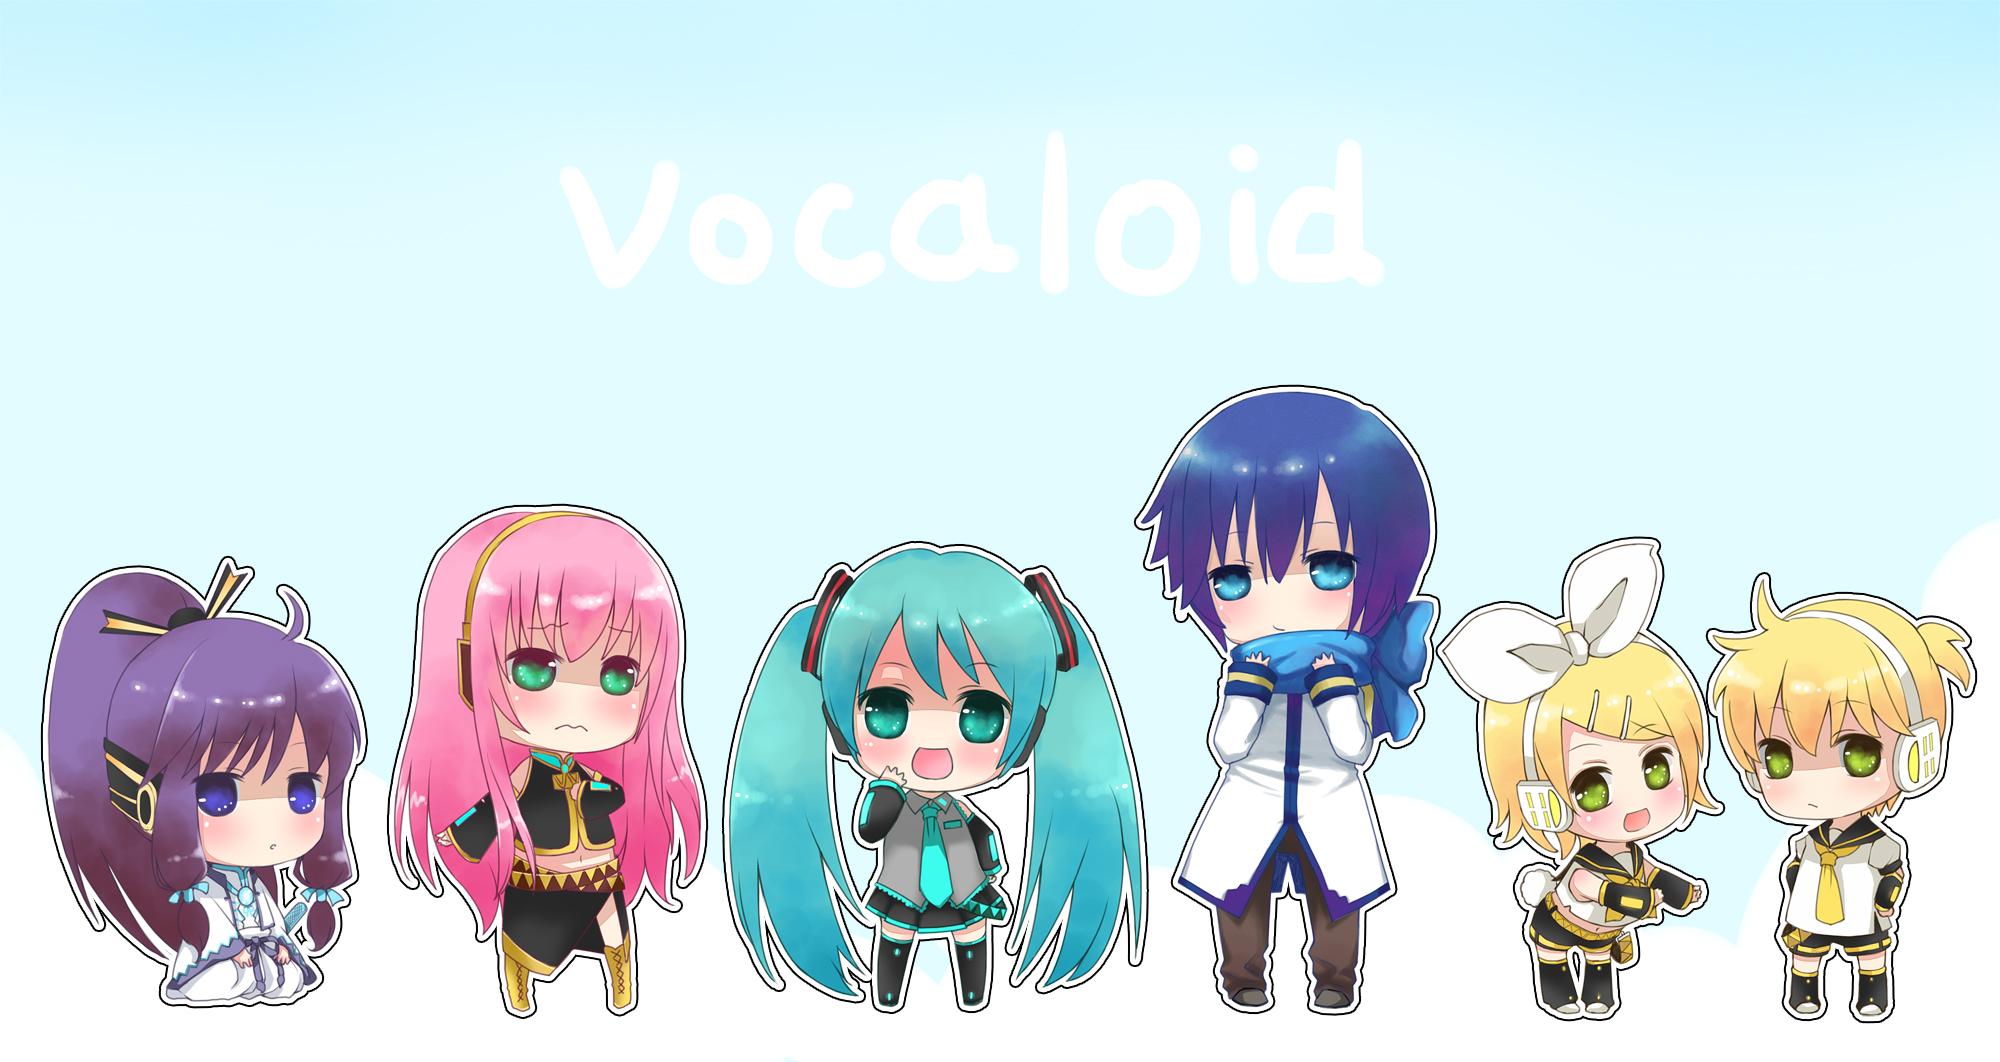 Vocaloid Chibi Group Wallpaper Chibi Group Computer W...